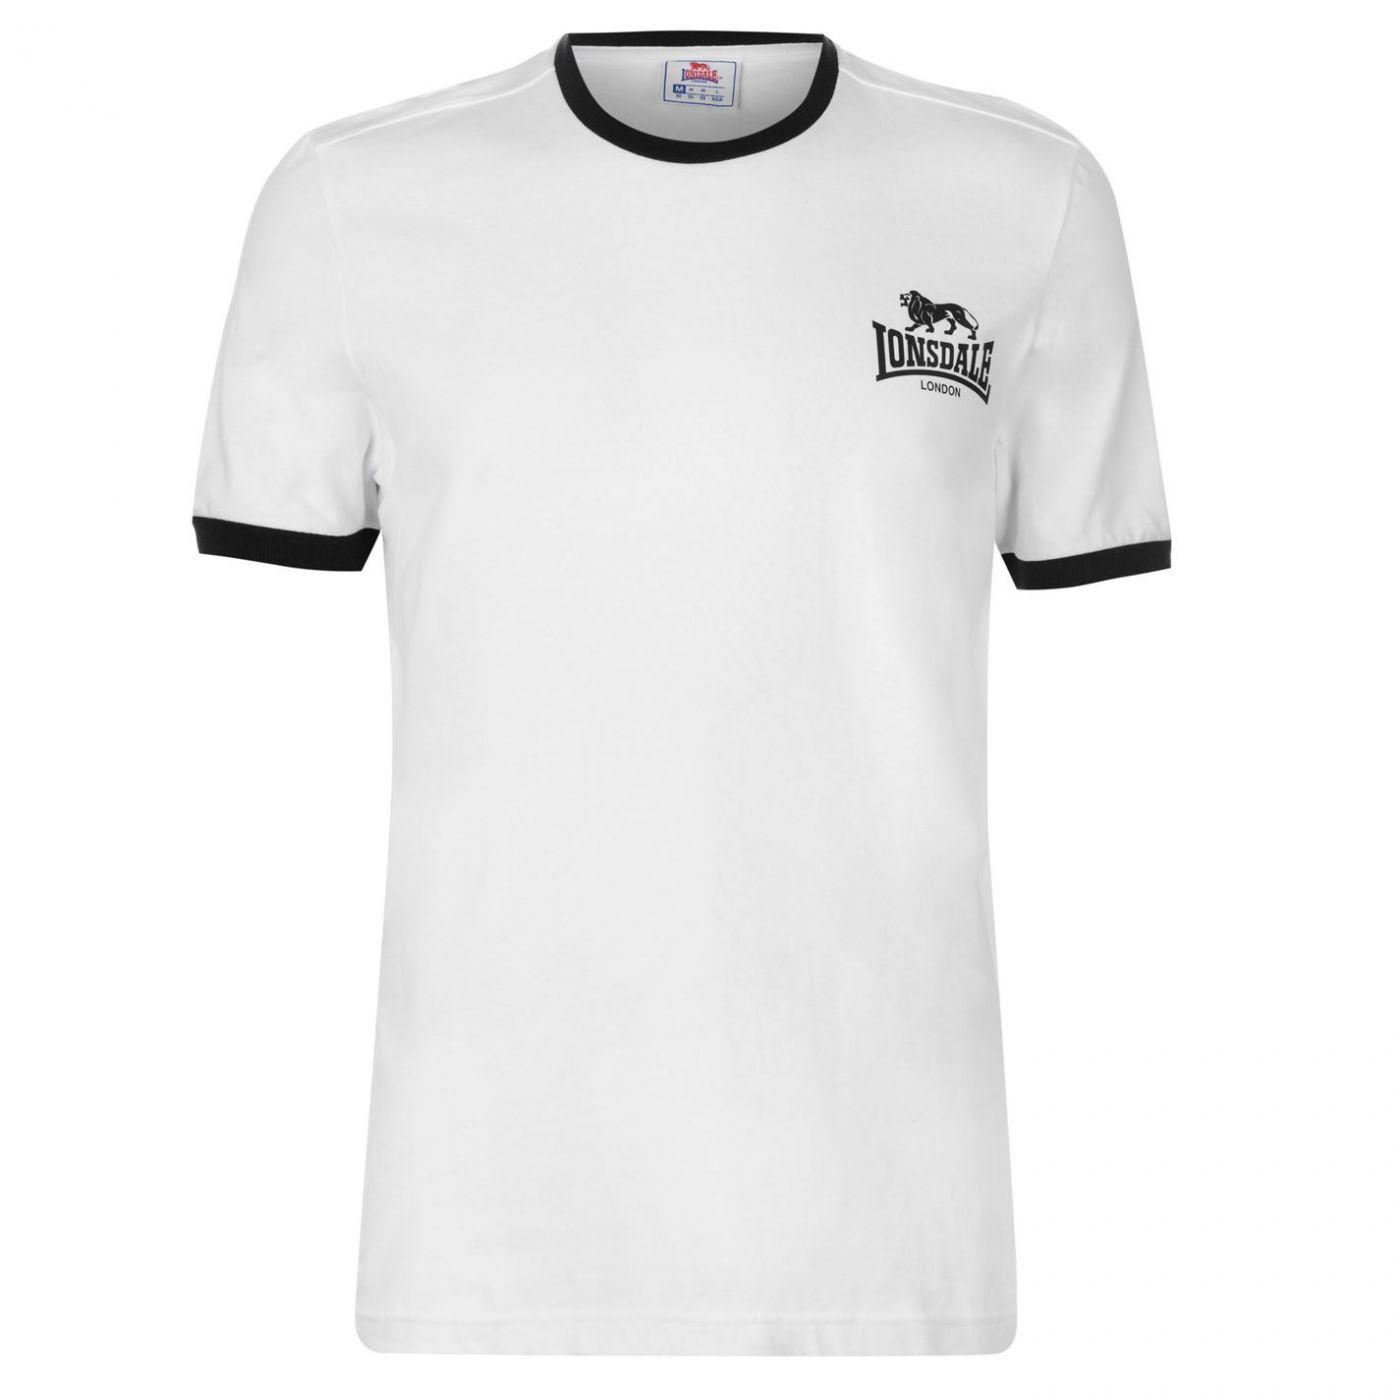 Lonsdale Ringer T Shirt Mens